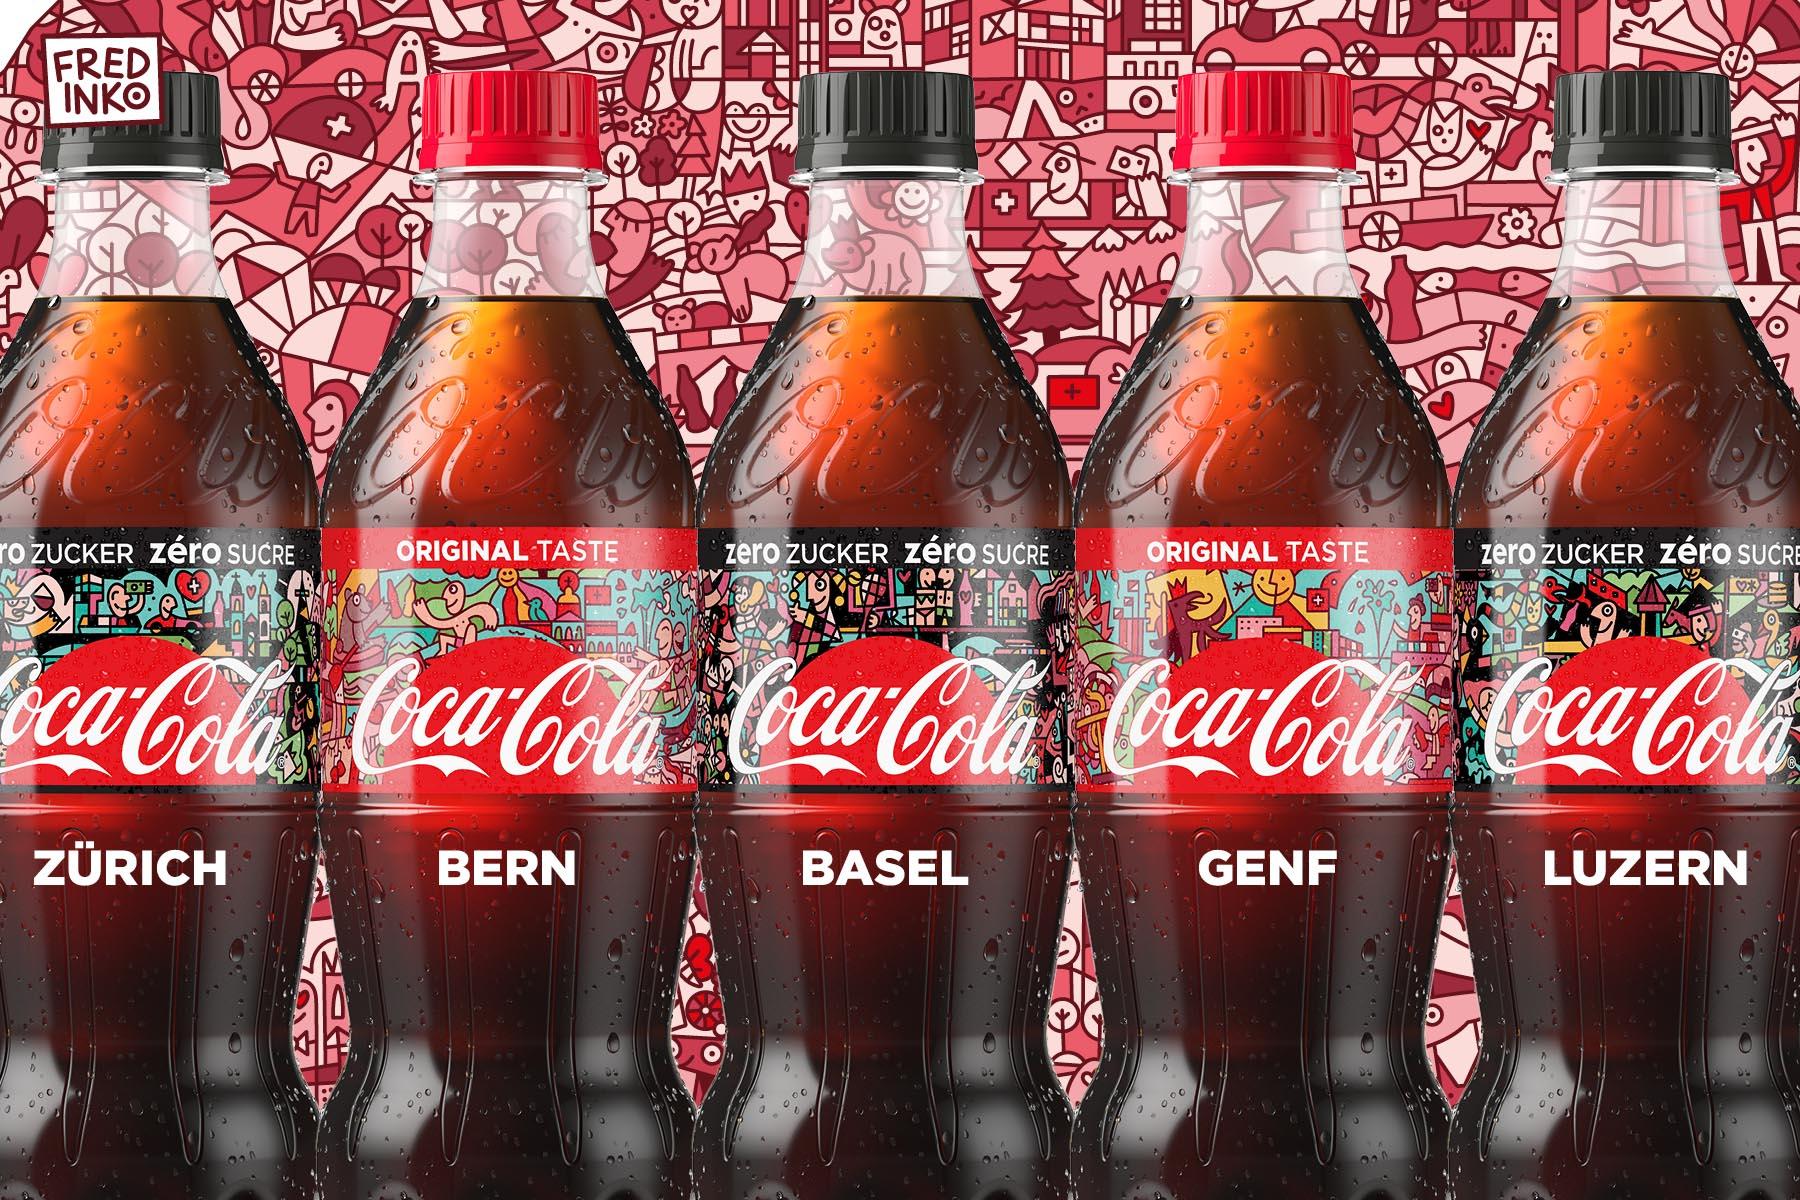 Coke_Fredinko_Doku3.jpg